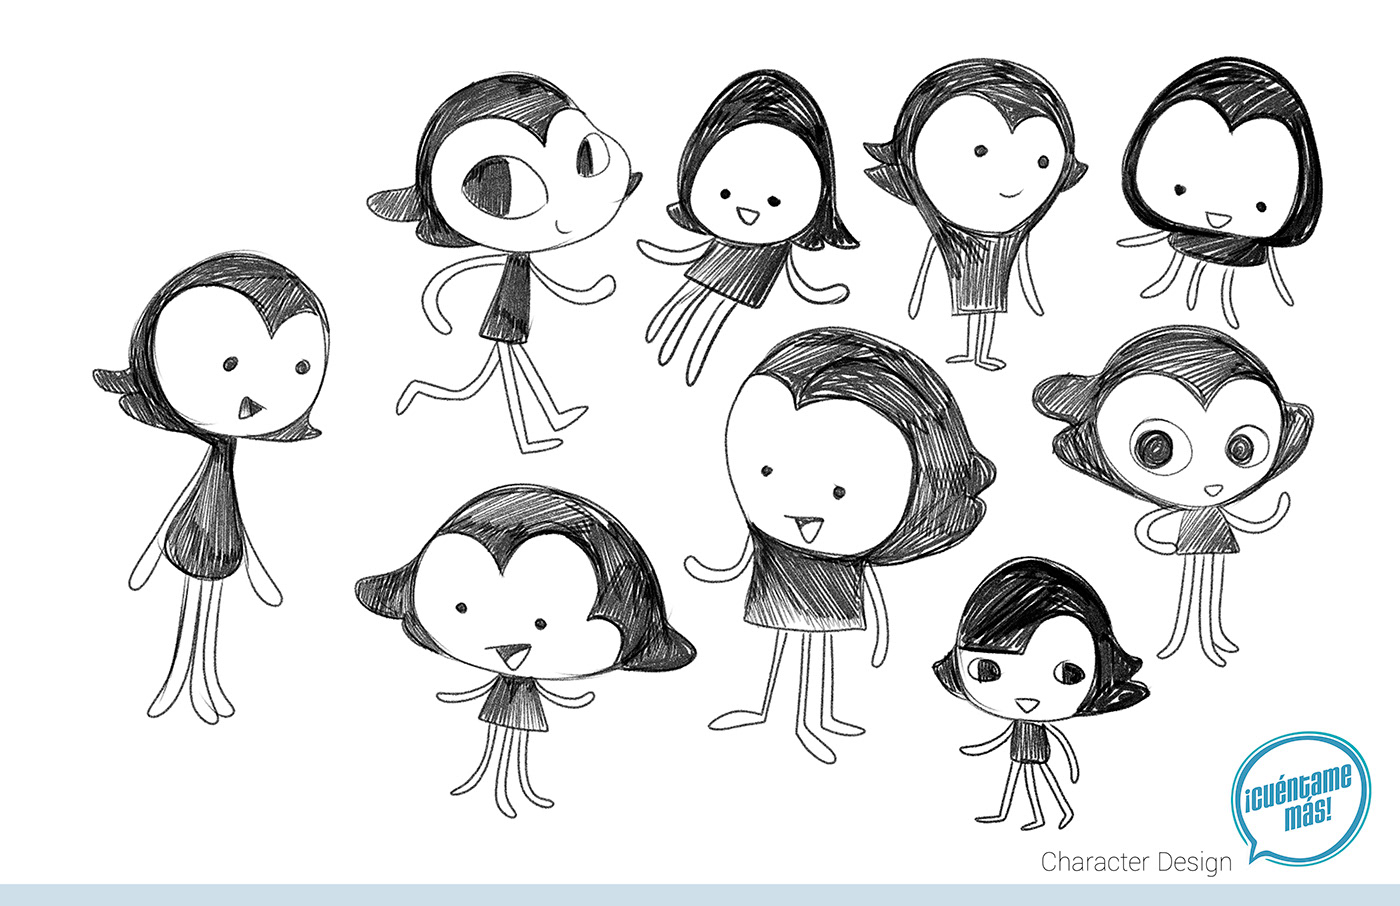 Image may contain: book, cartoon and drawing